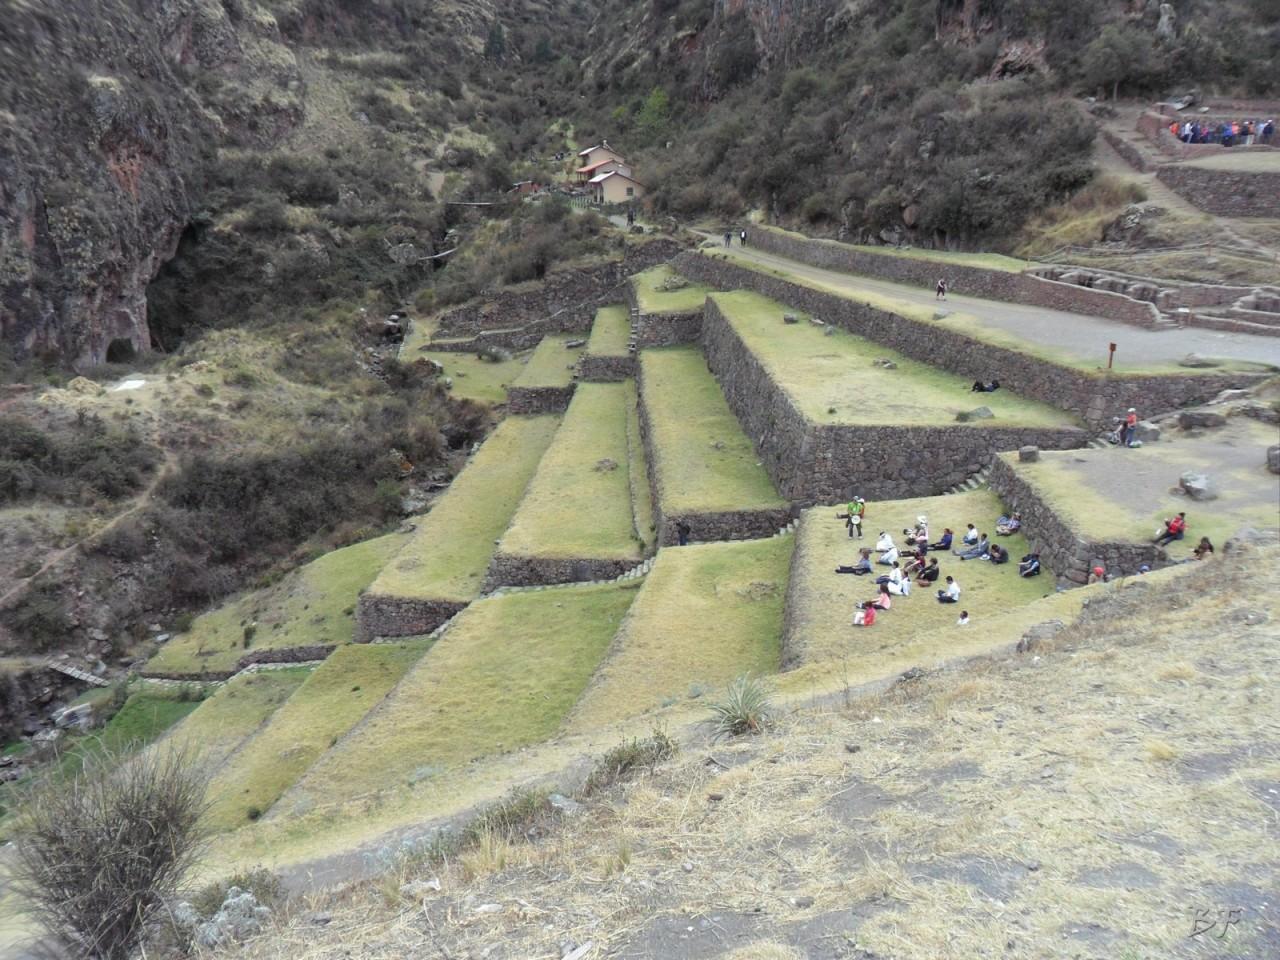 Mura-Poligonali-Megaliti-Altari-Rupestri-Pisac-Cusco-Perù-11